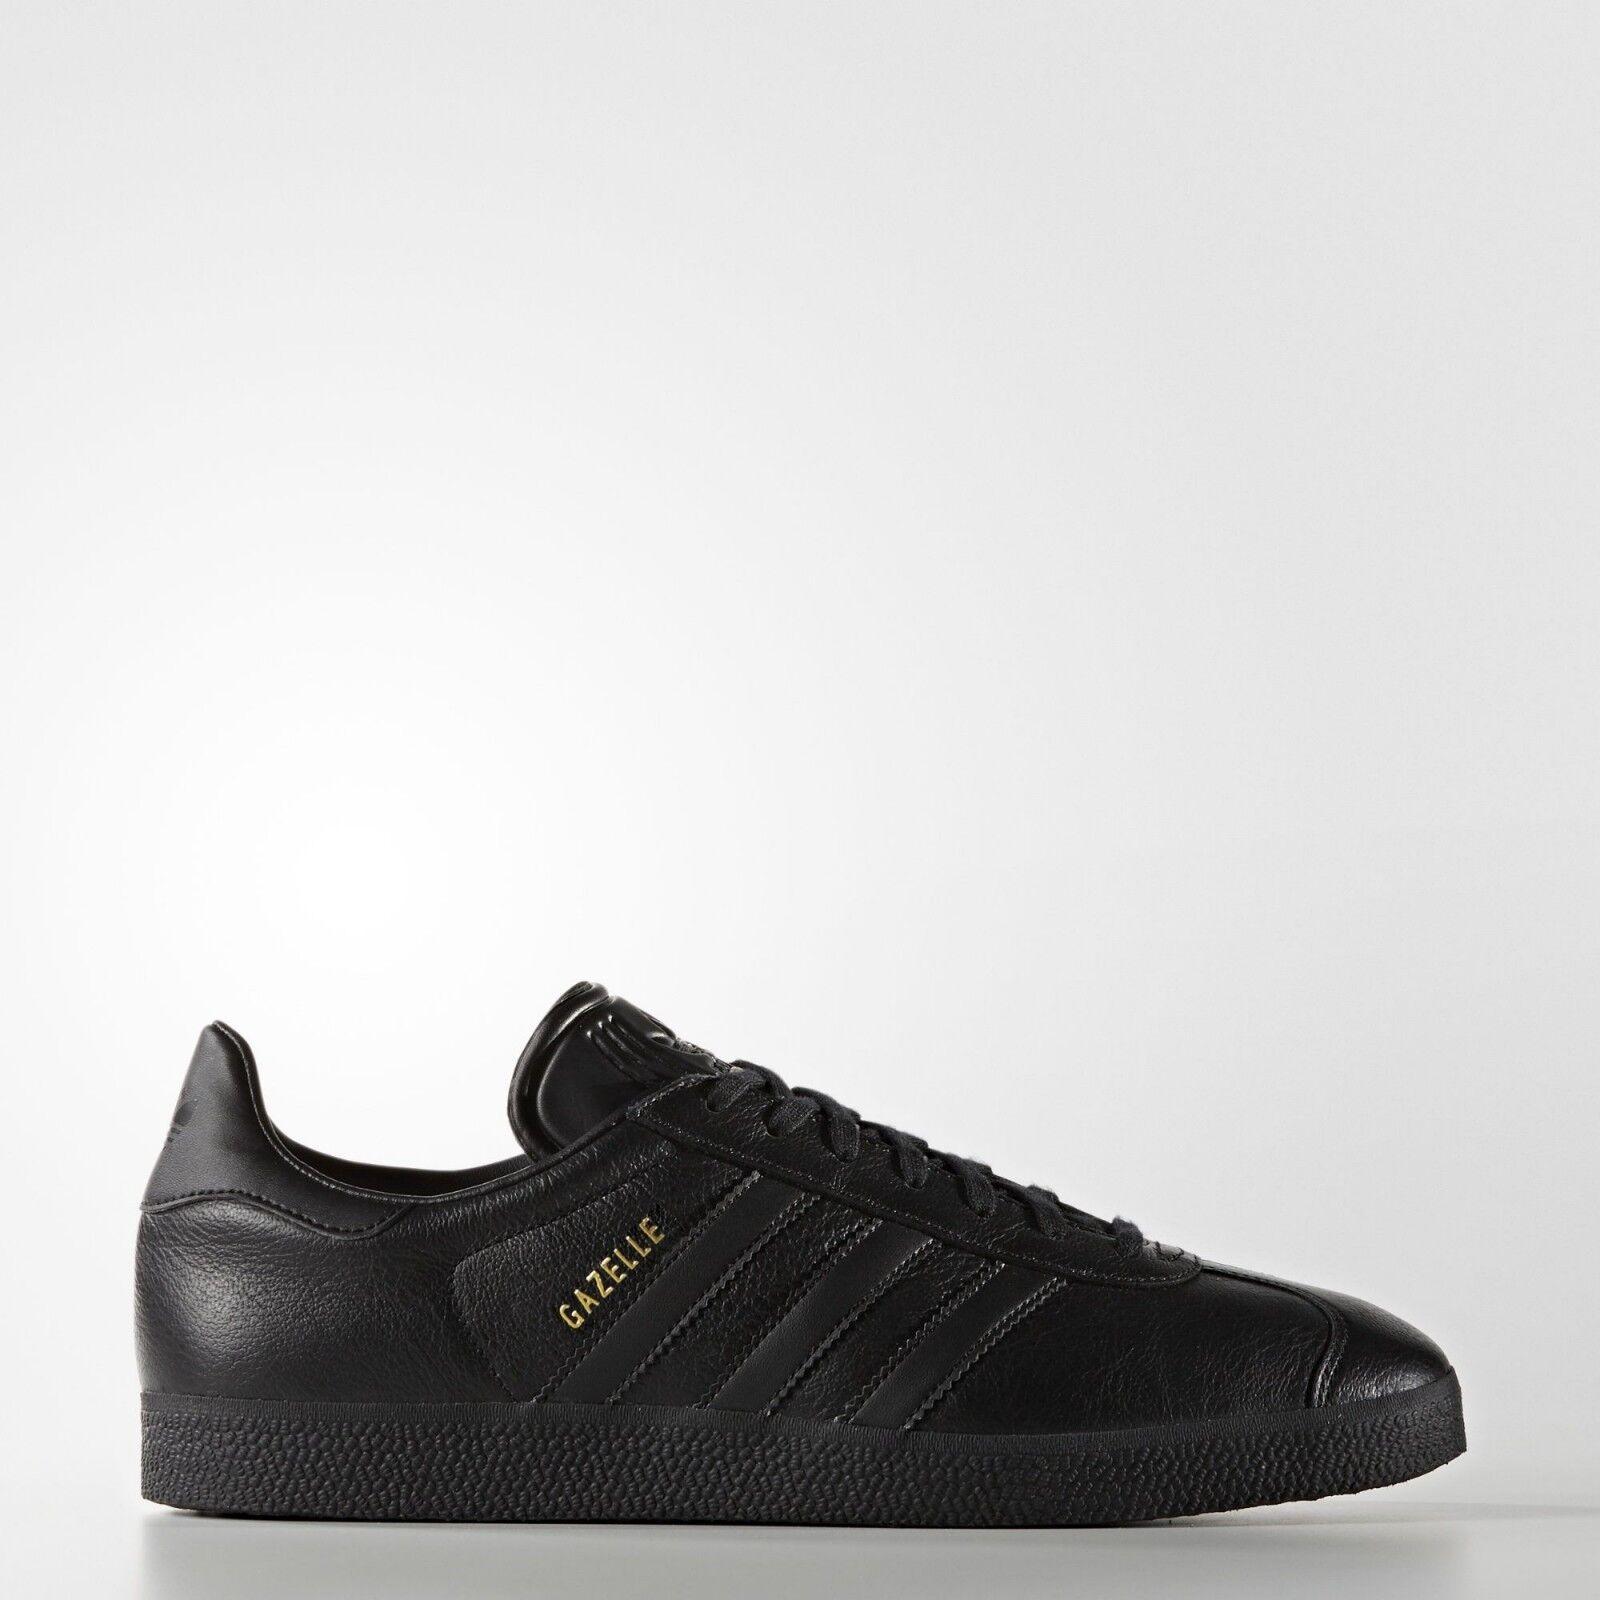 Adidas Gazelle Mens Swarz Gold Metallic Leather Athletic Turnschuhe 10 10.5 11